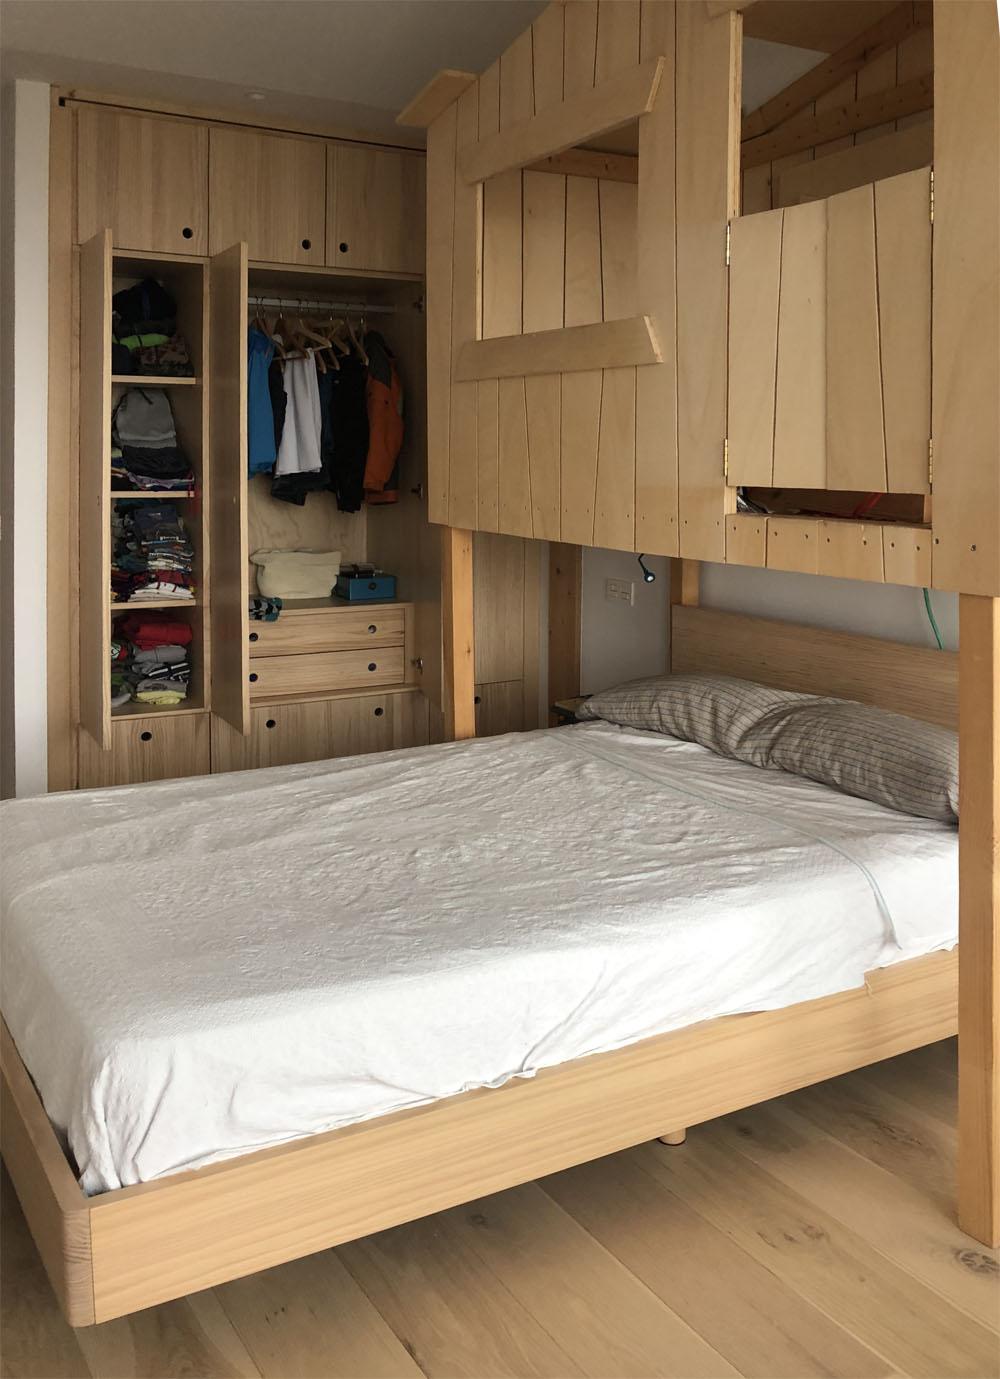 armario ropero de madera maciza color natural